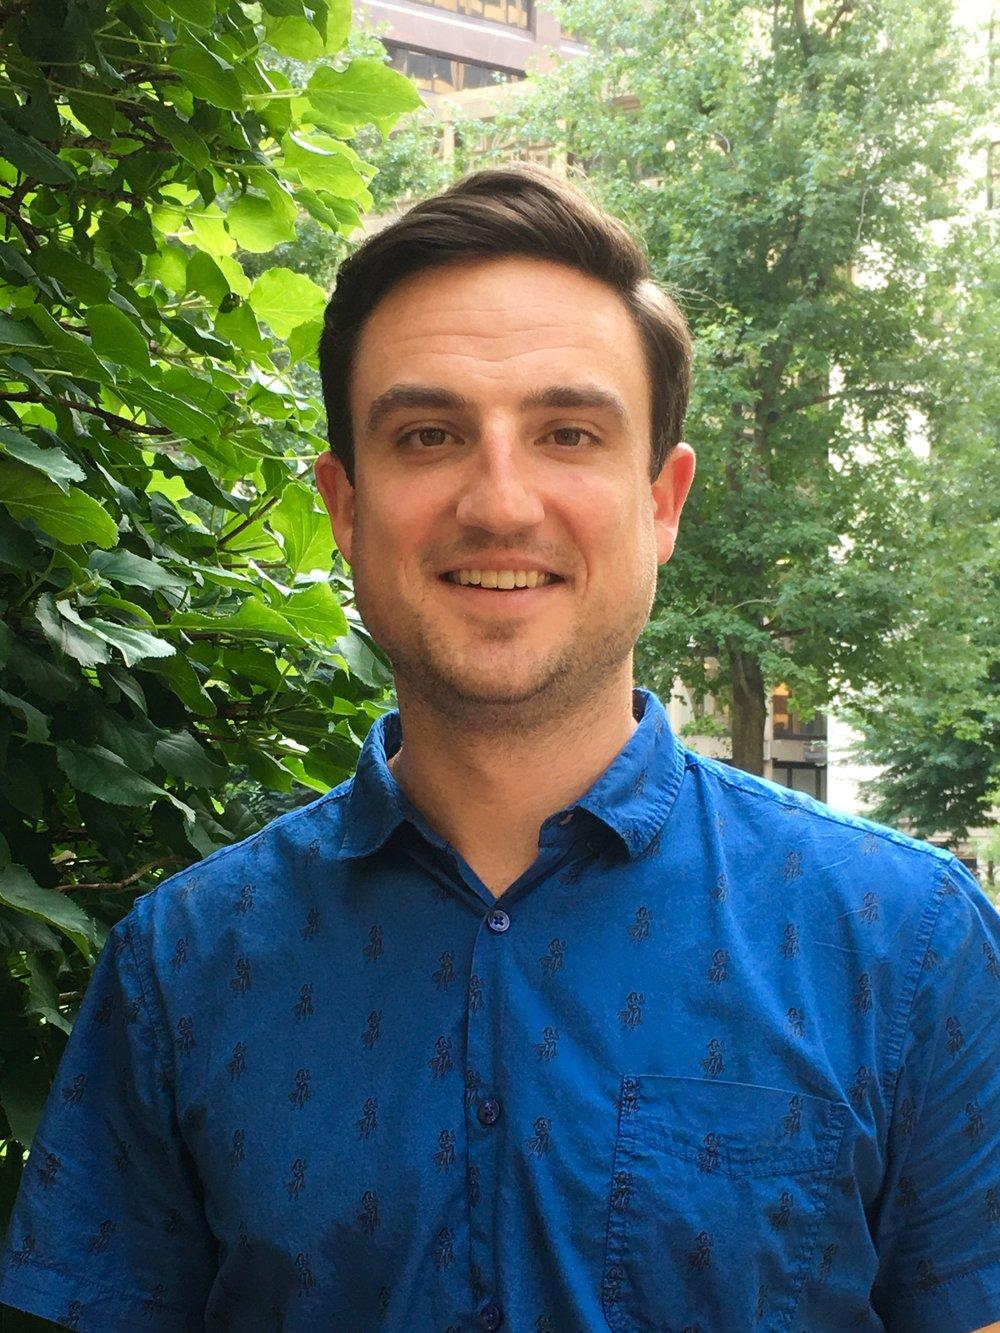 Chris Elia - Head of Partnerships